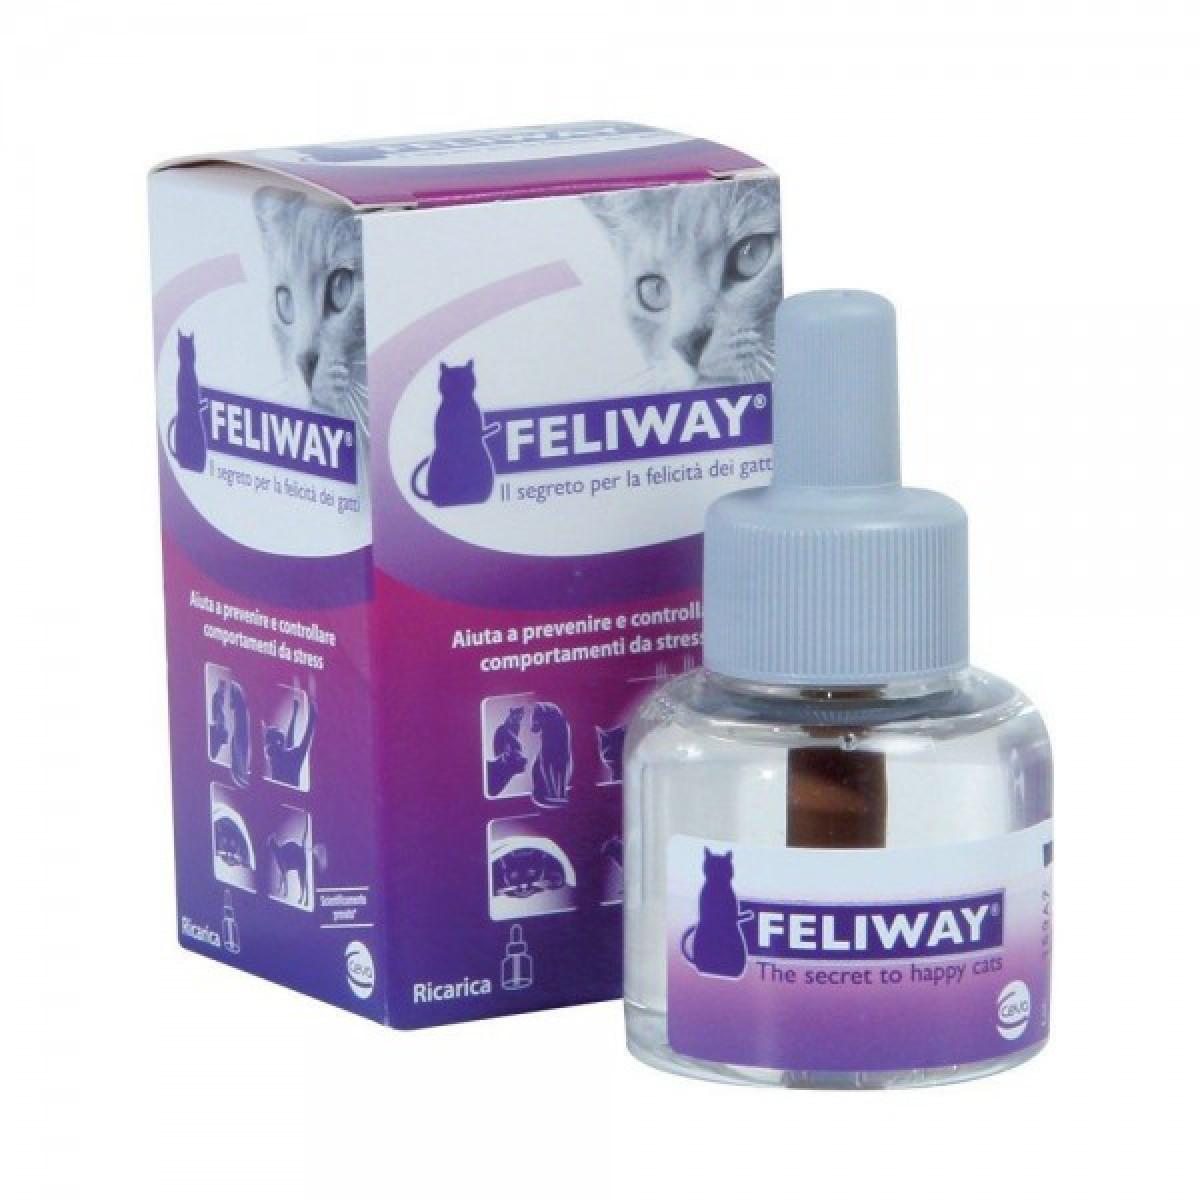 Image of Ceva Feliway Classic Ricarica 48ml 926828486